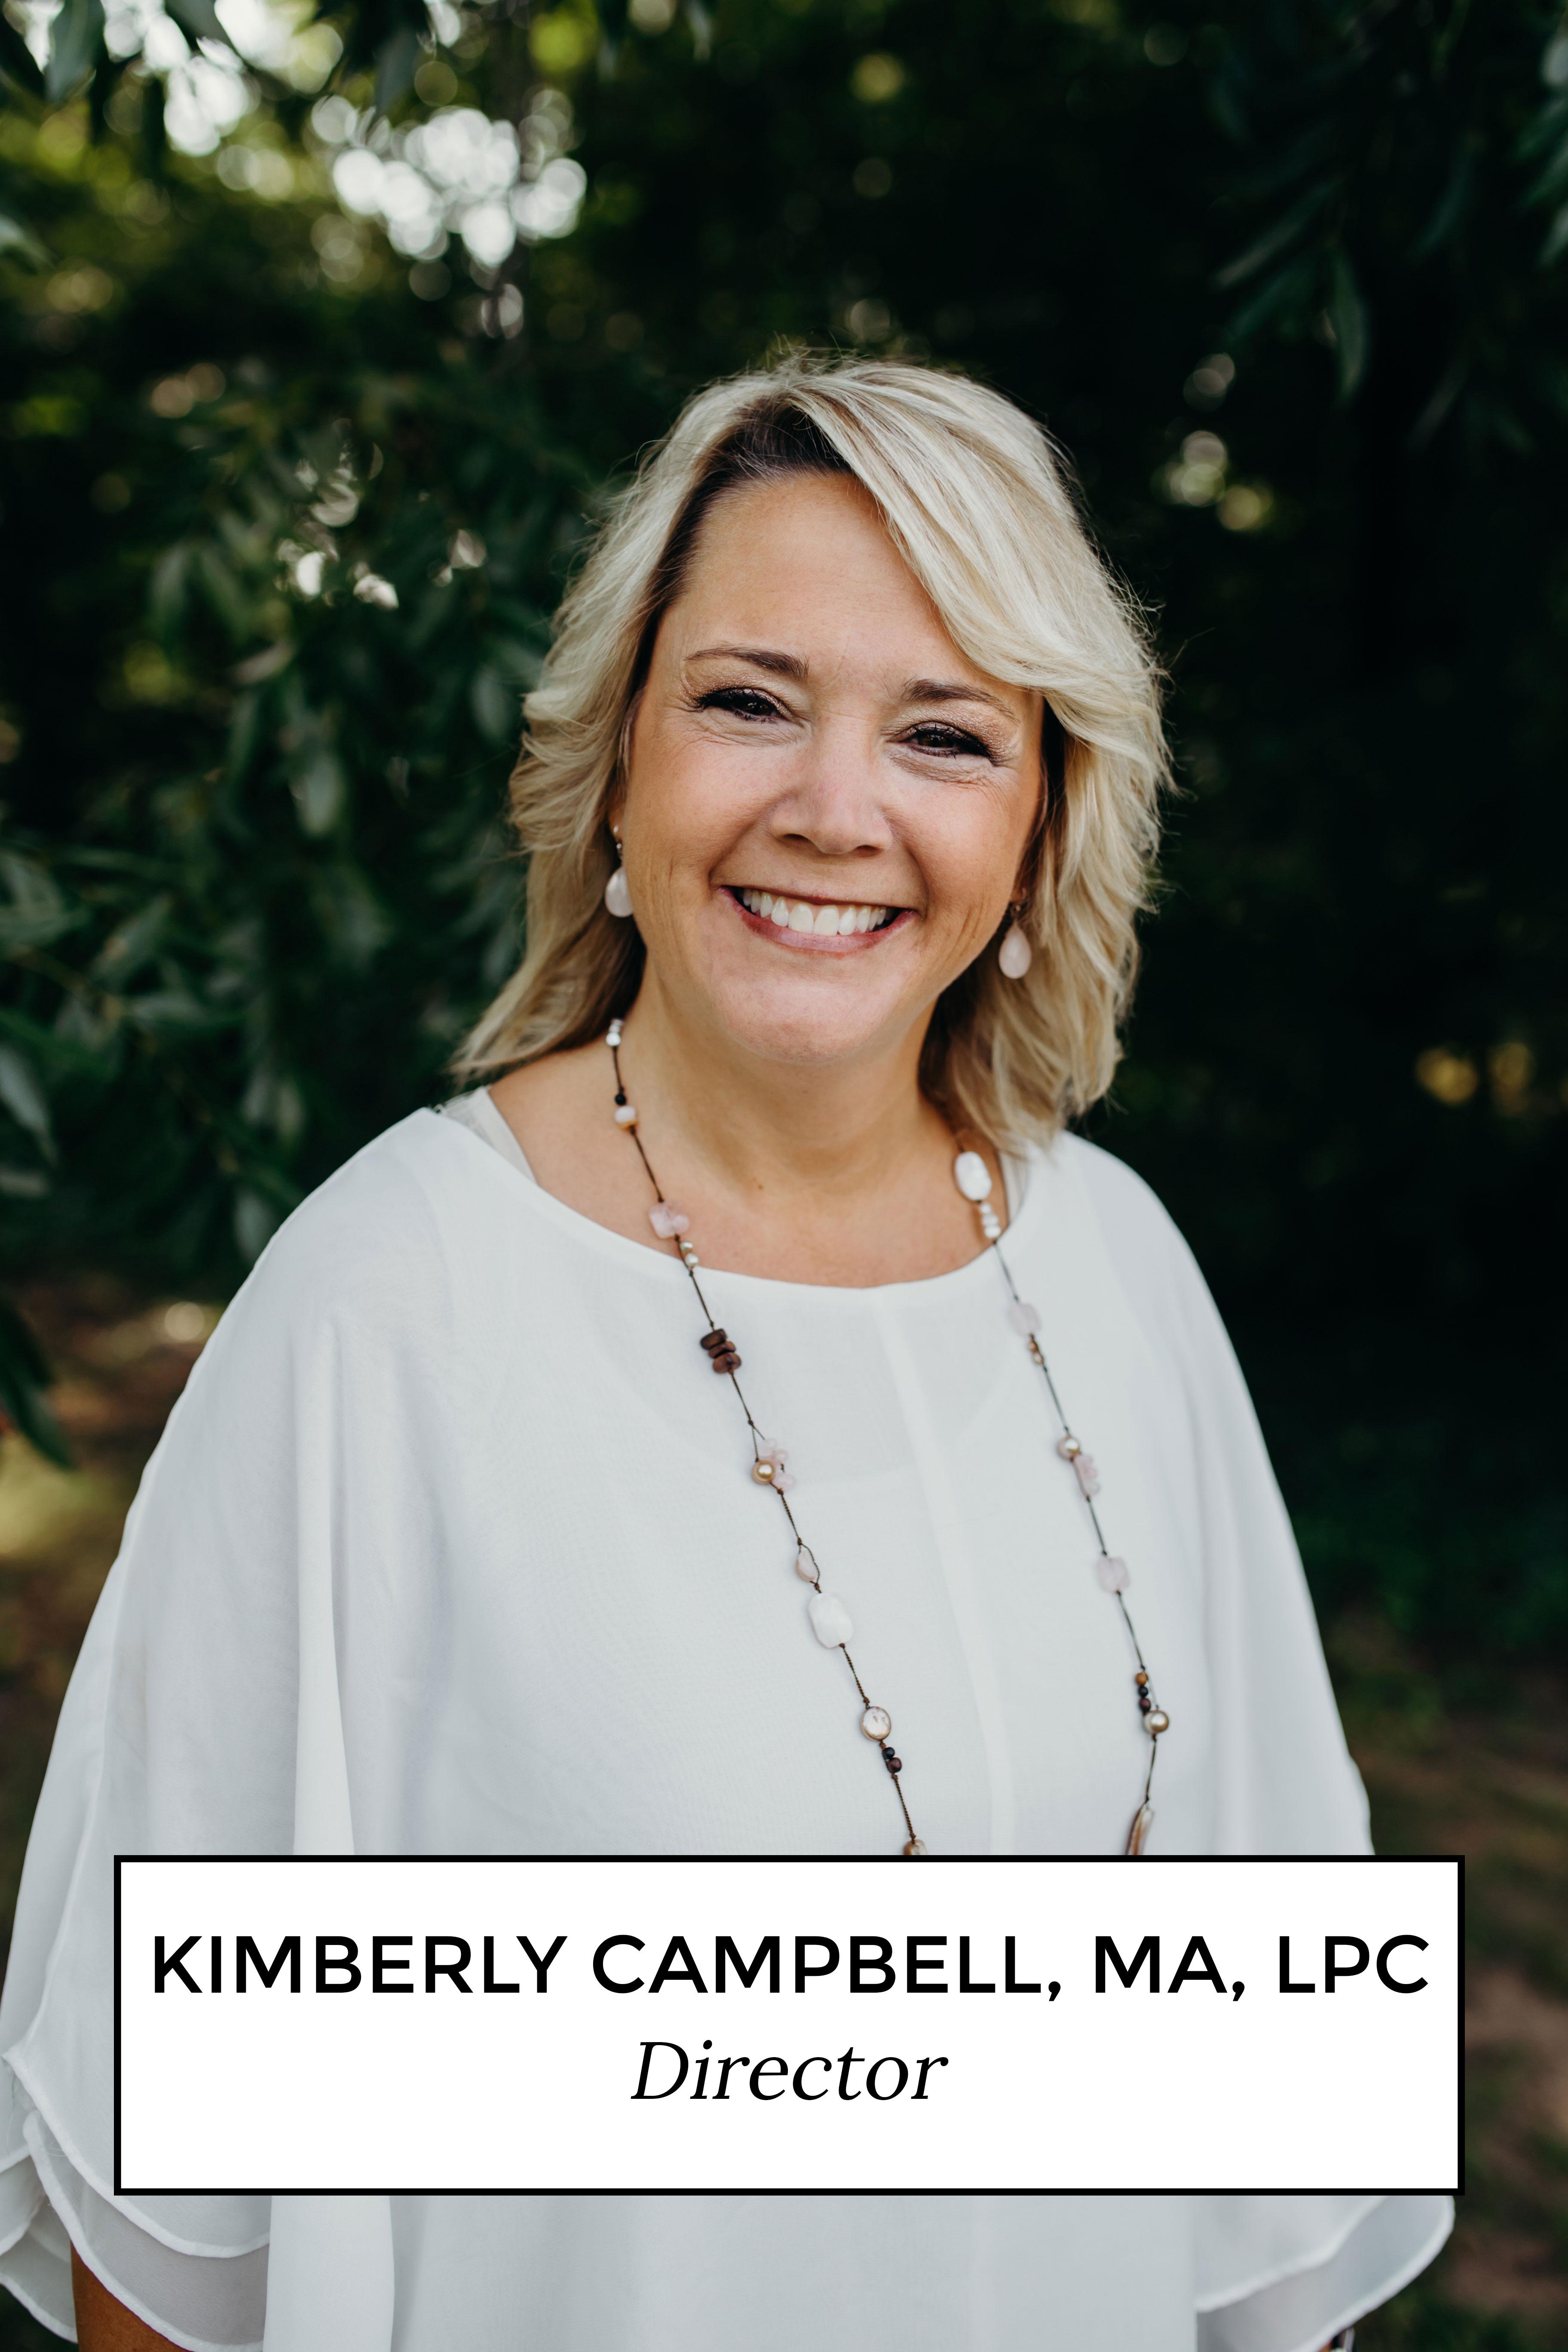 Kimberly Campbell, MA, LPC - Director